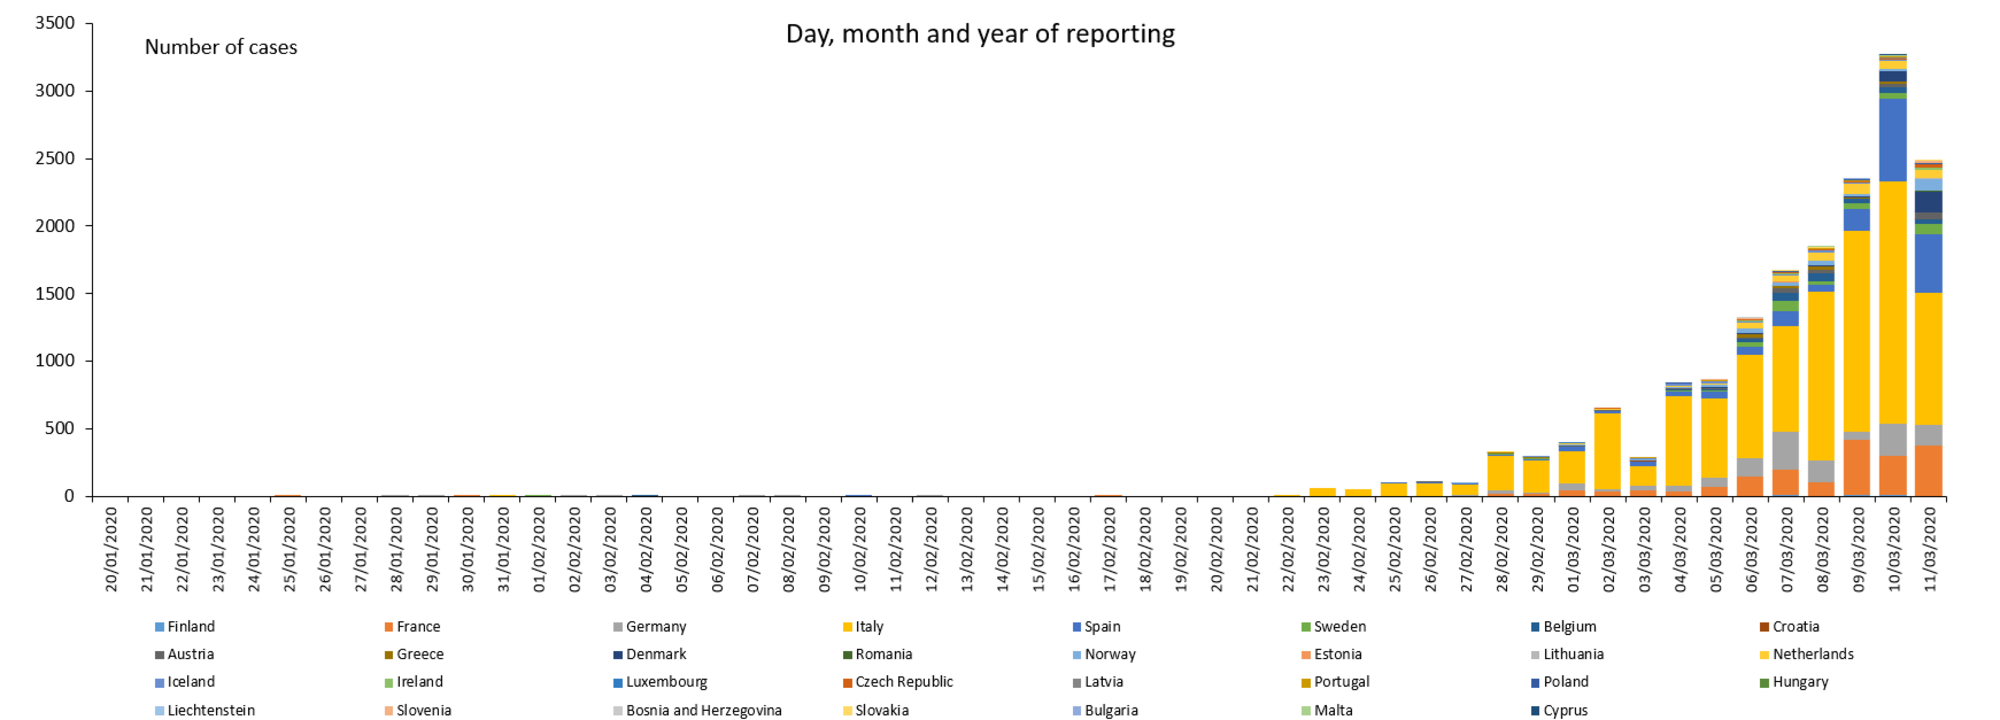 Coronavirus in EU/EEA and the UK, March 11